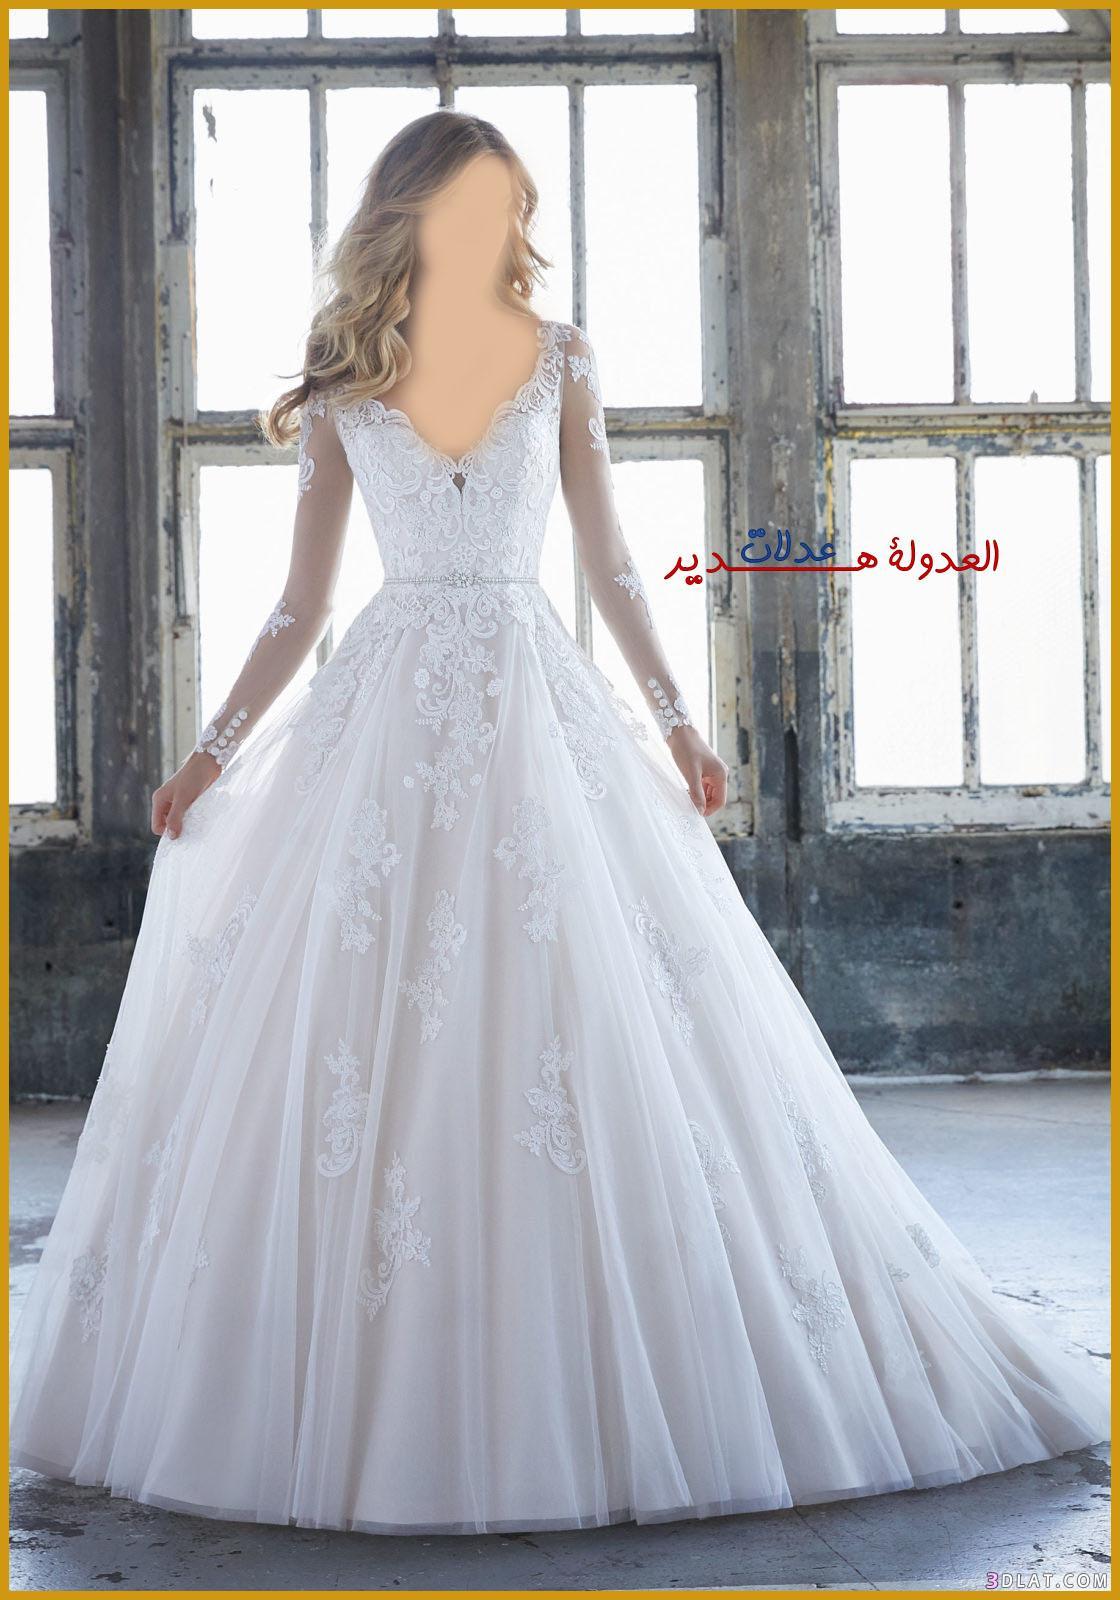 فساتين زفاف فخمة 2018,فساتين اعراس ناعمة,فساتين 3dlat.com_27_18_86ac